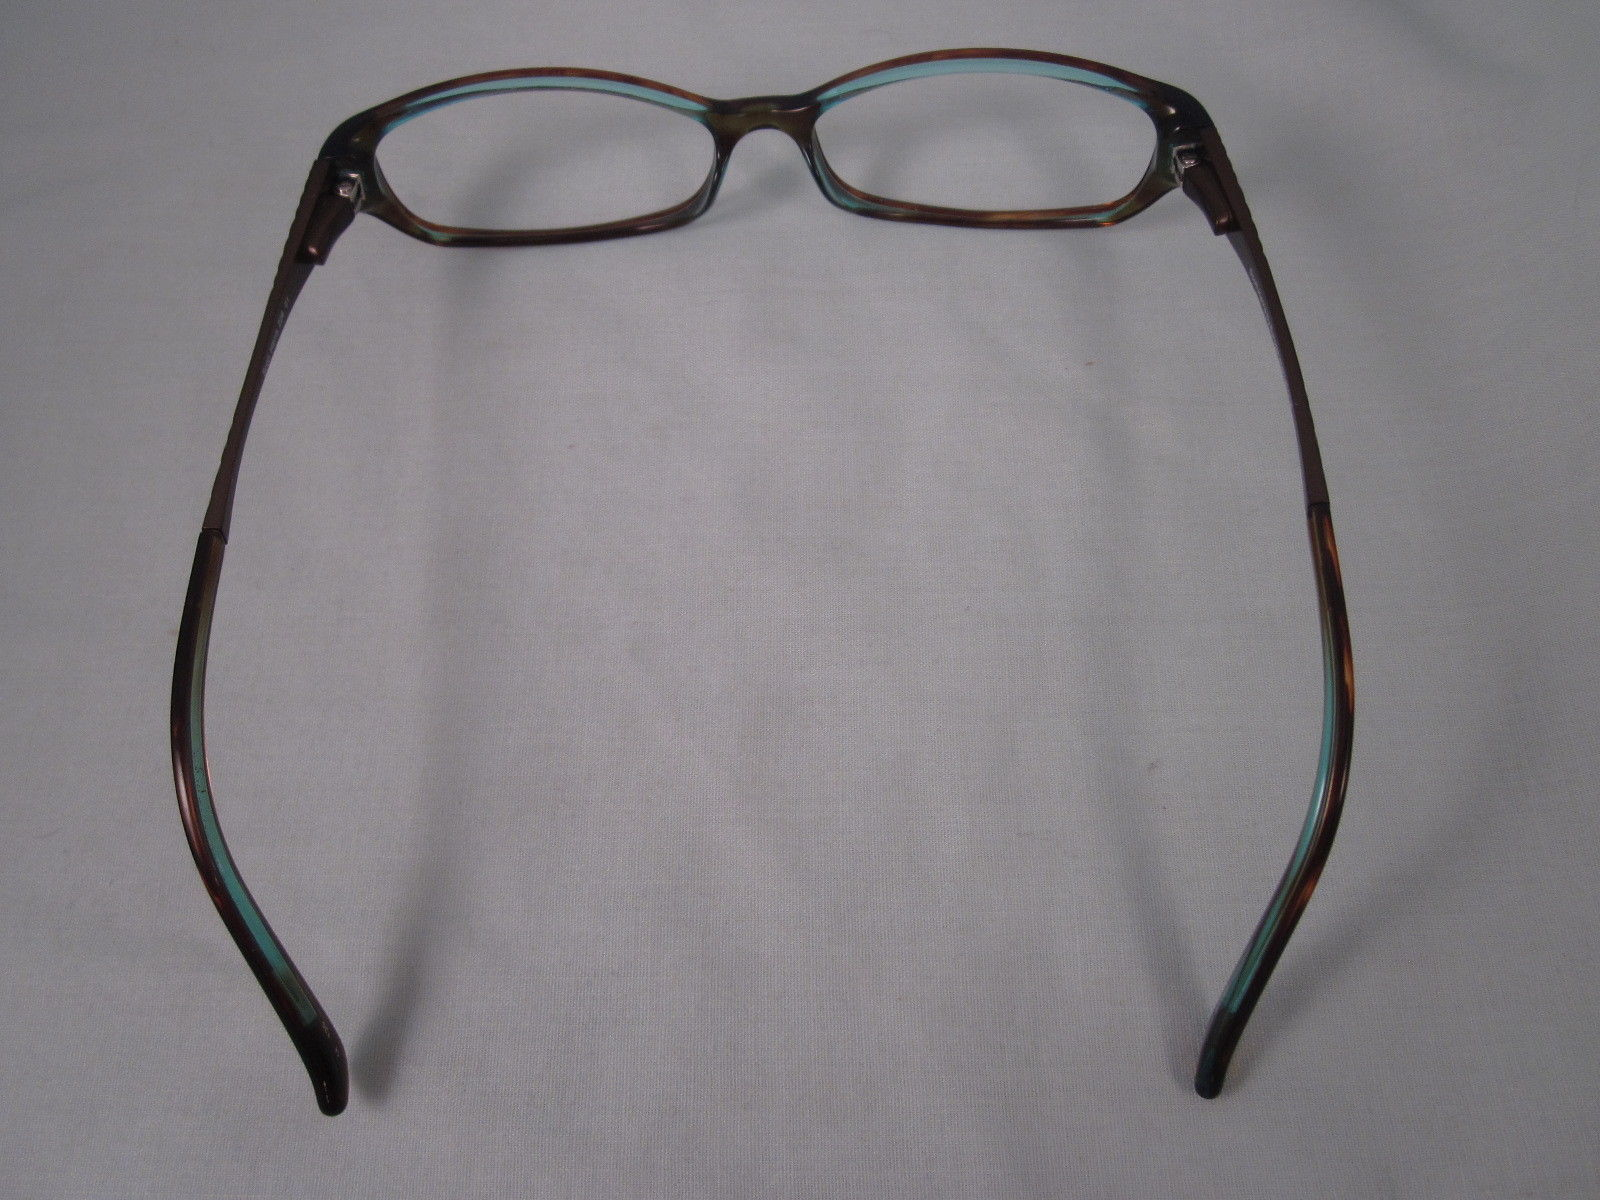 Scott Harris Rx Eyeglasses 228 01 Aqua and 36 similar items